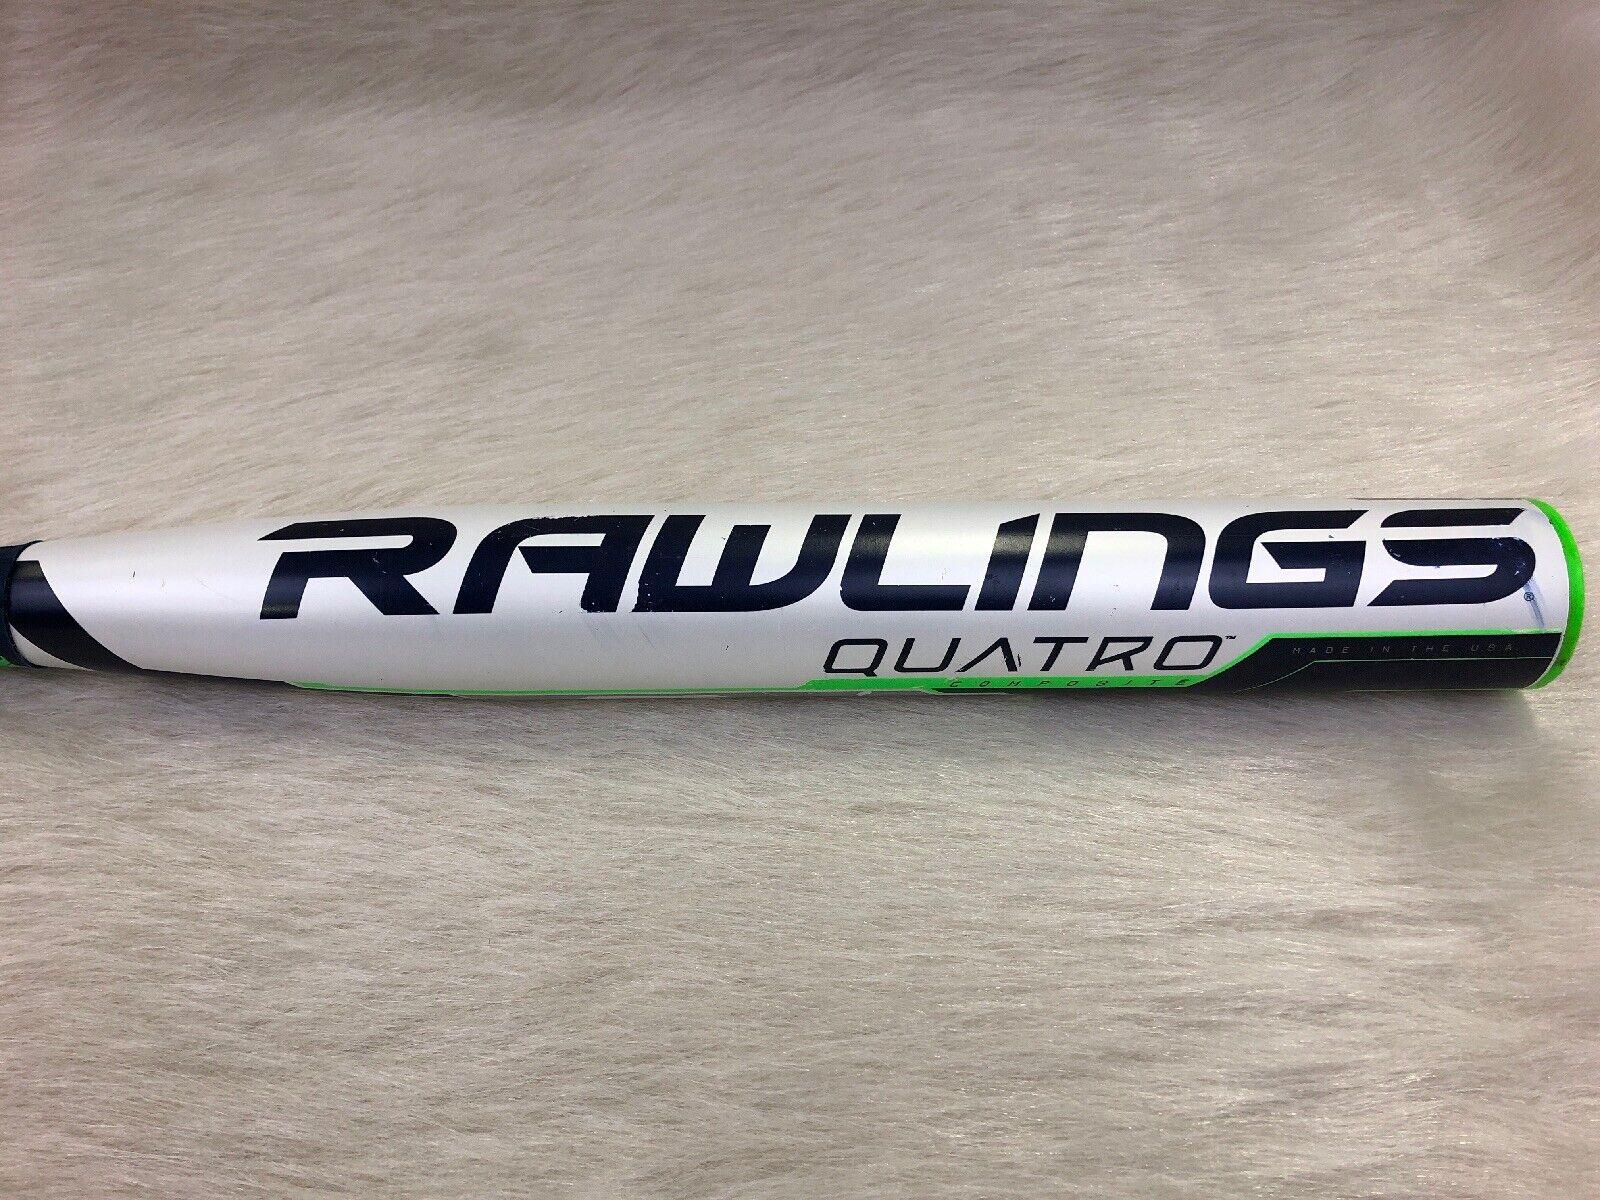 2018 Rawlings Quatro 33 24 FP8Q9 (-9) Composite Fastpitch Softball Softball Softball Bat d8cb6c